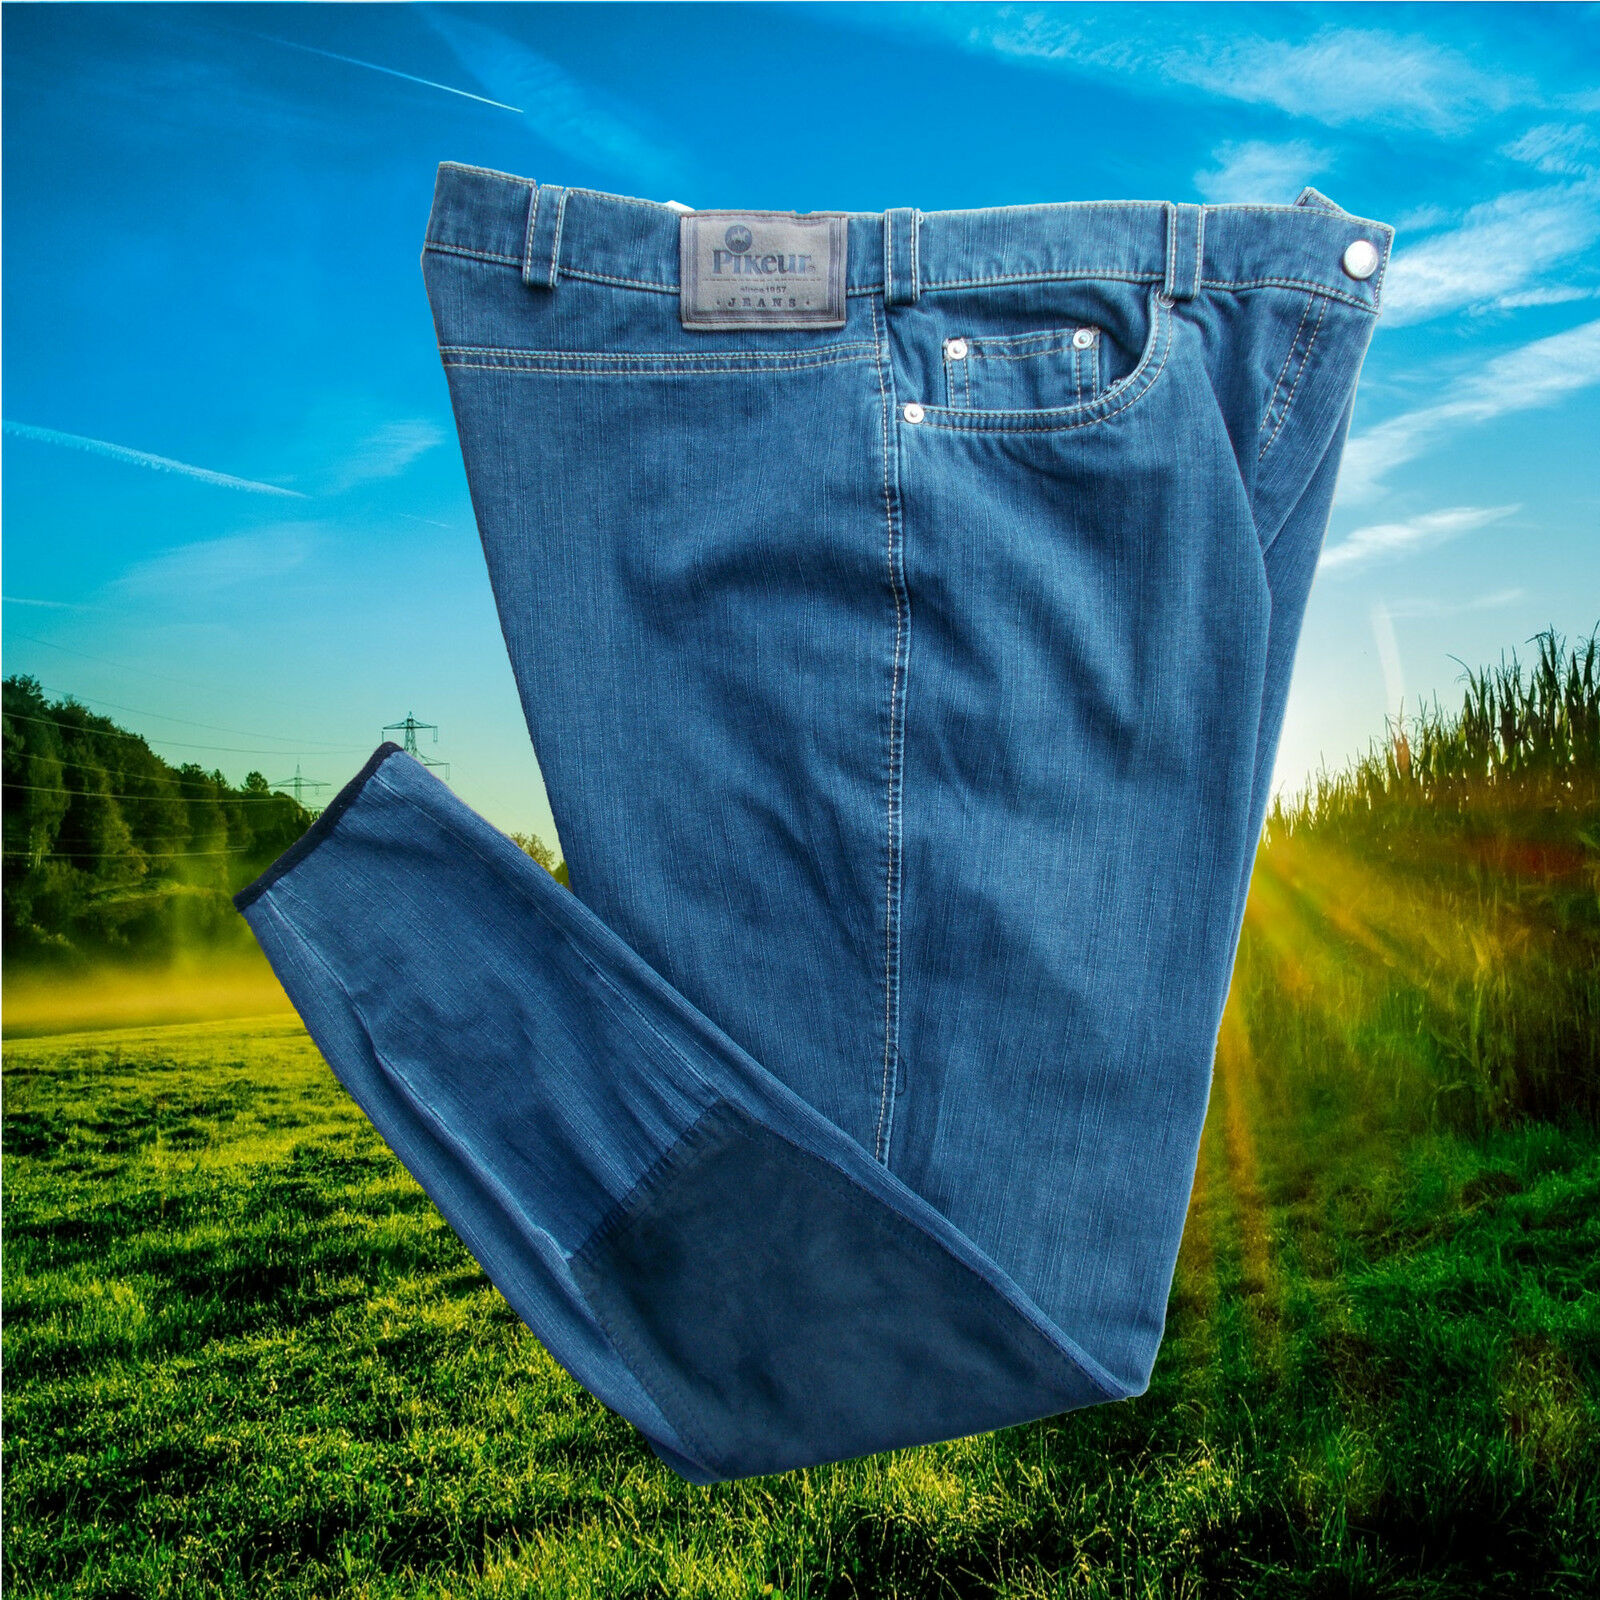 Pikeur Reithose LAVINIA, Vollbesatz, blau, Jeansreithose,Pikeur Lavinia, Jeans